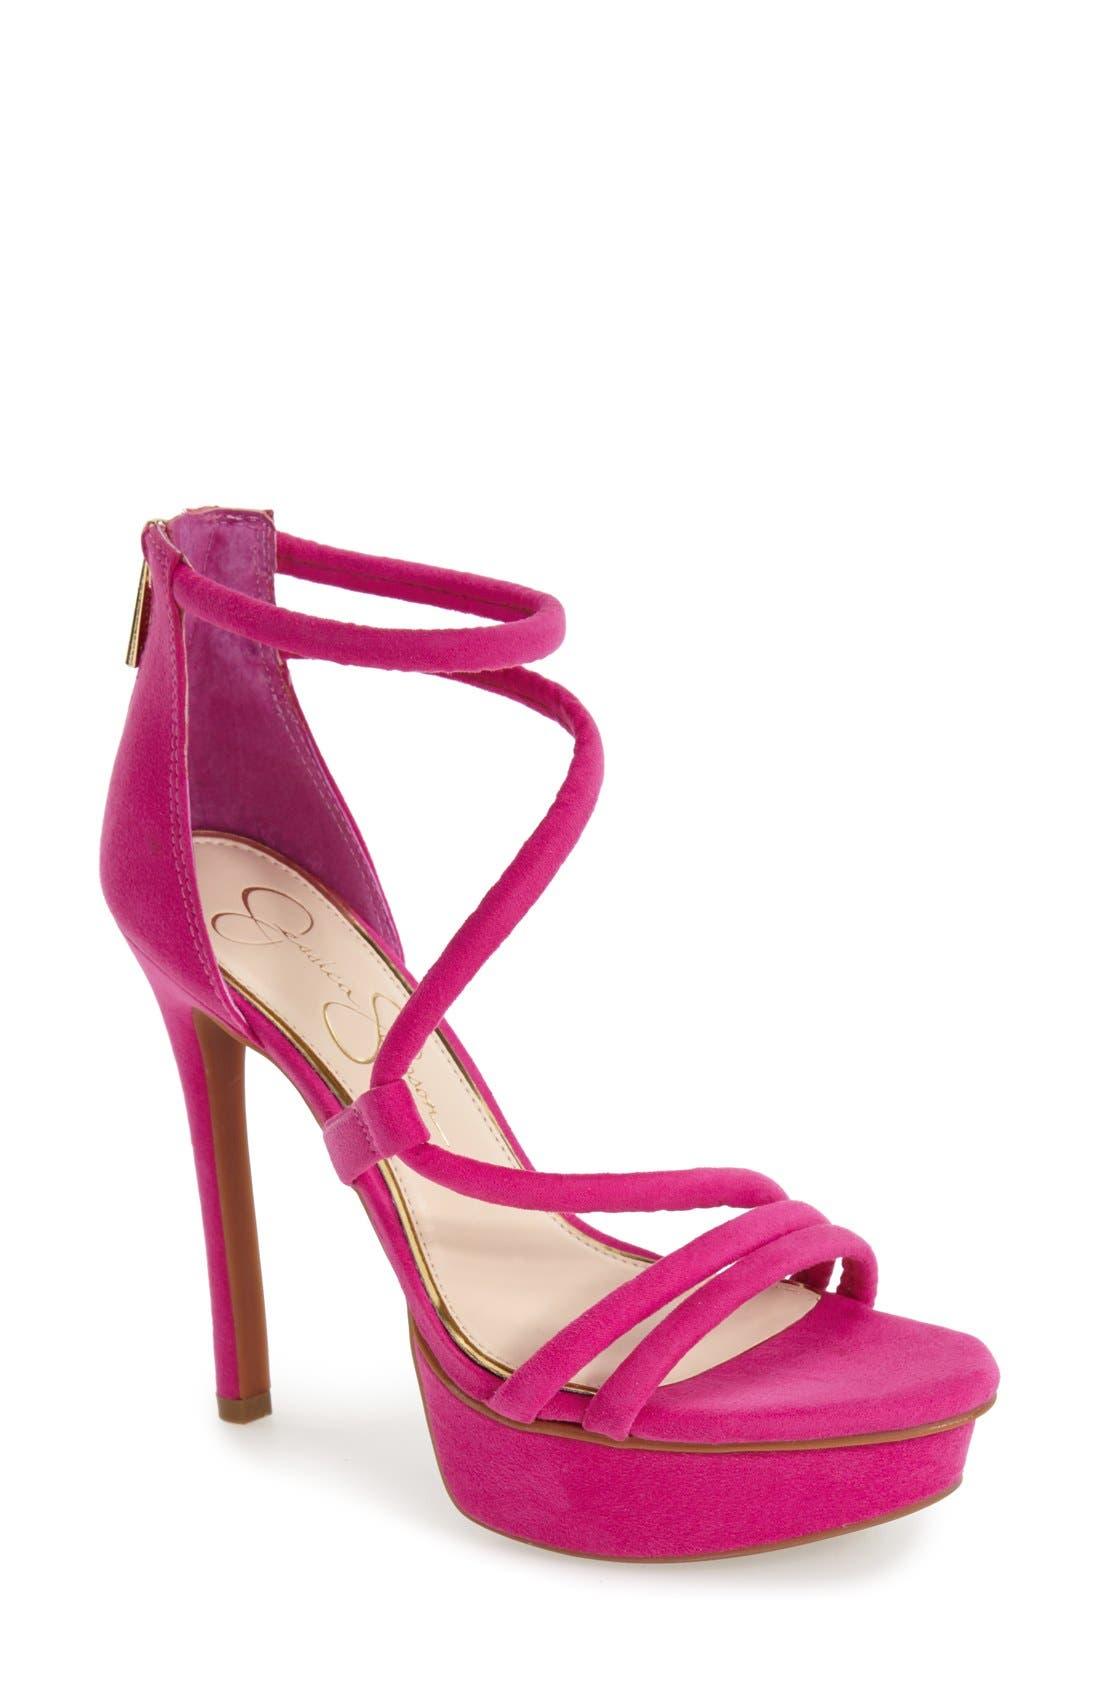 Main Image - Jessica Simpson 'Caela' Platform Sandal (Women)